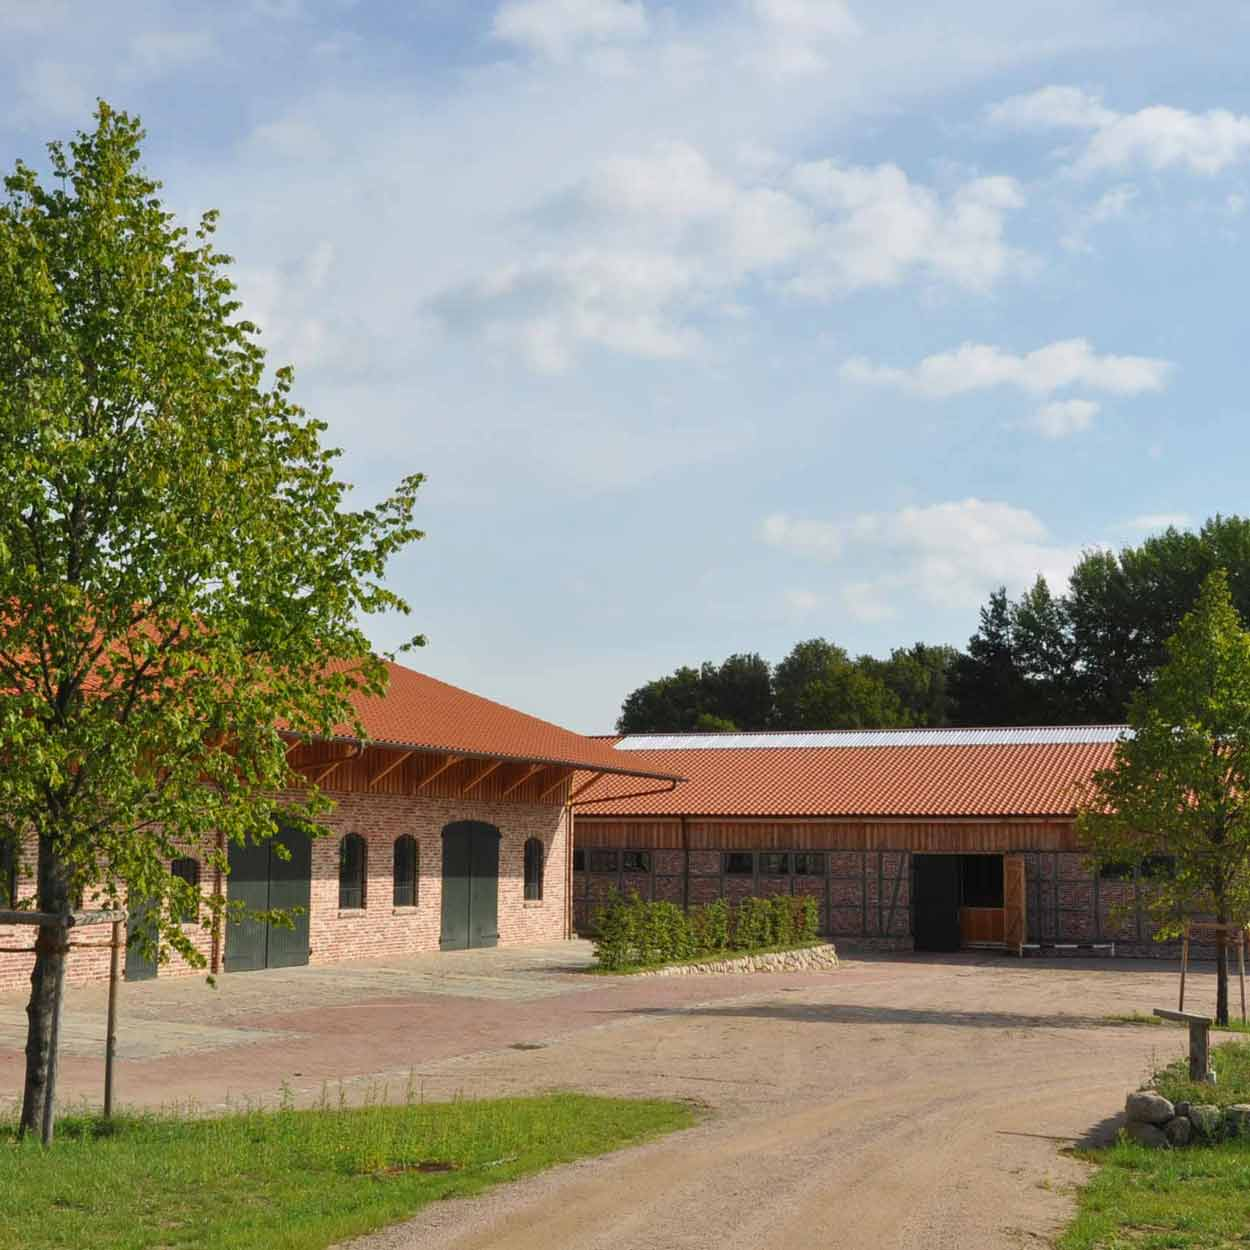 Hof in Niedersachsen mit Tilia europaea Pallida Allee